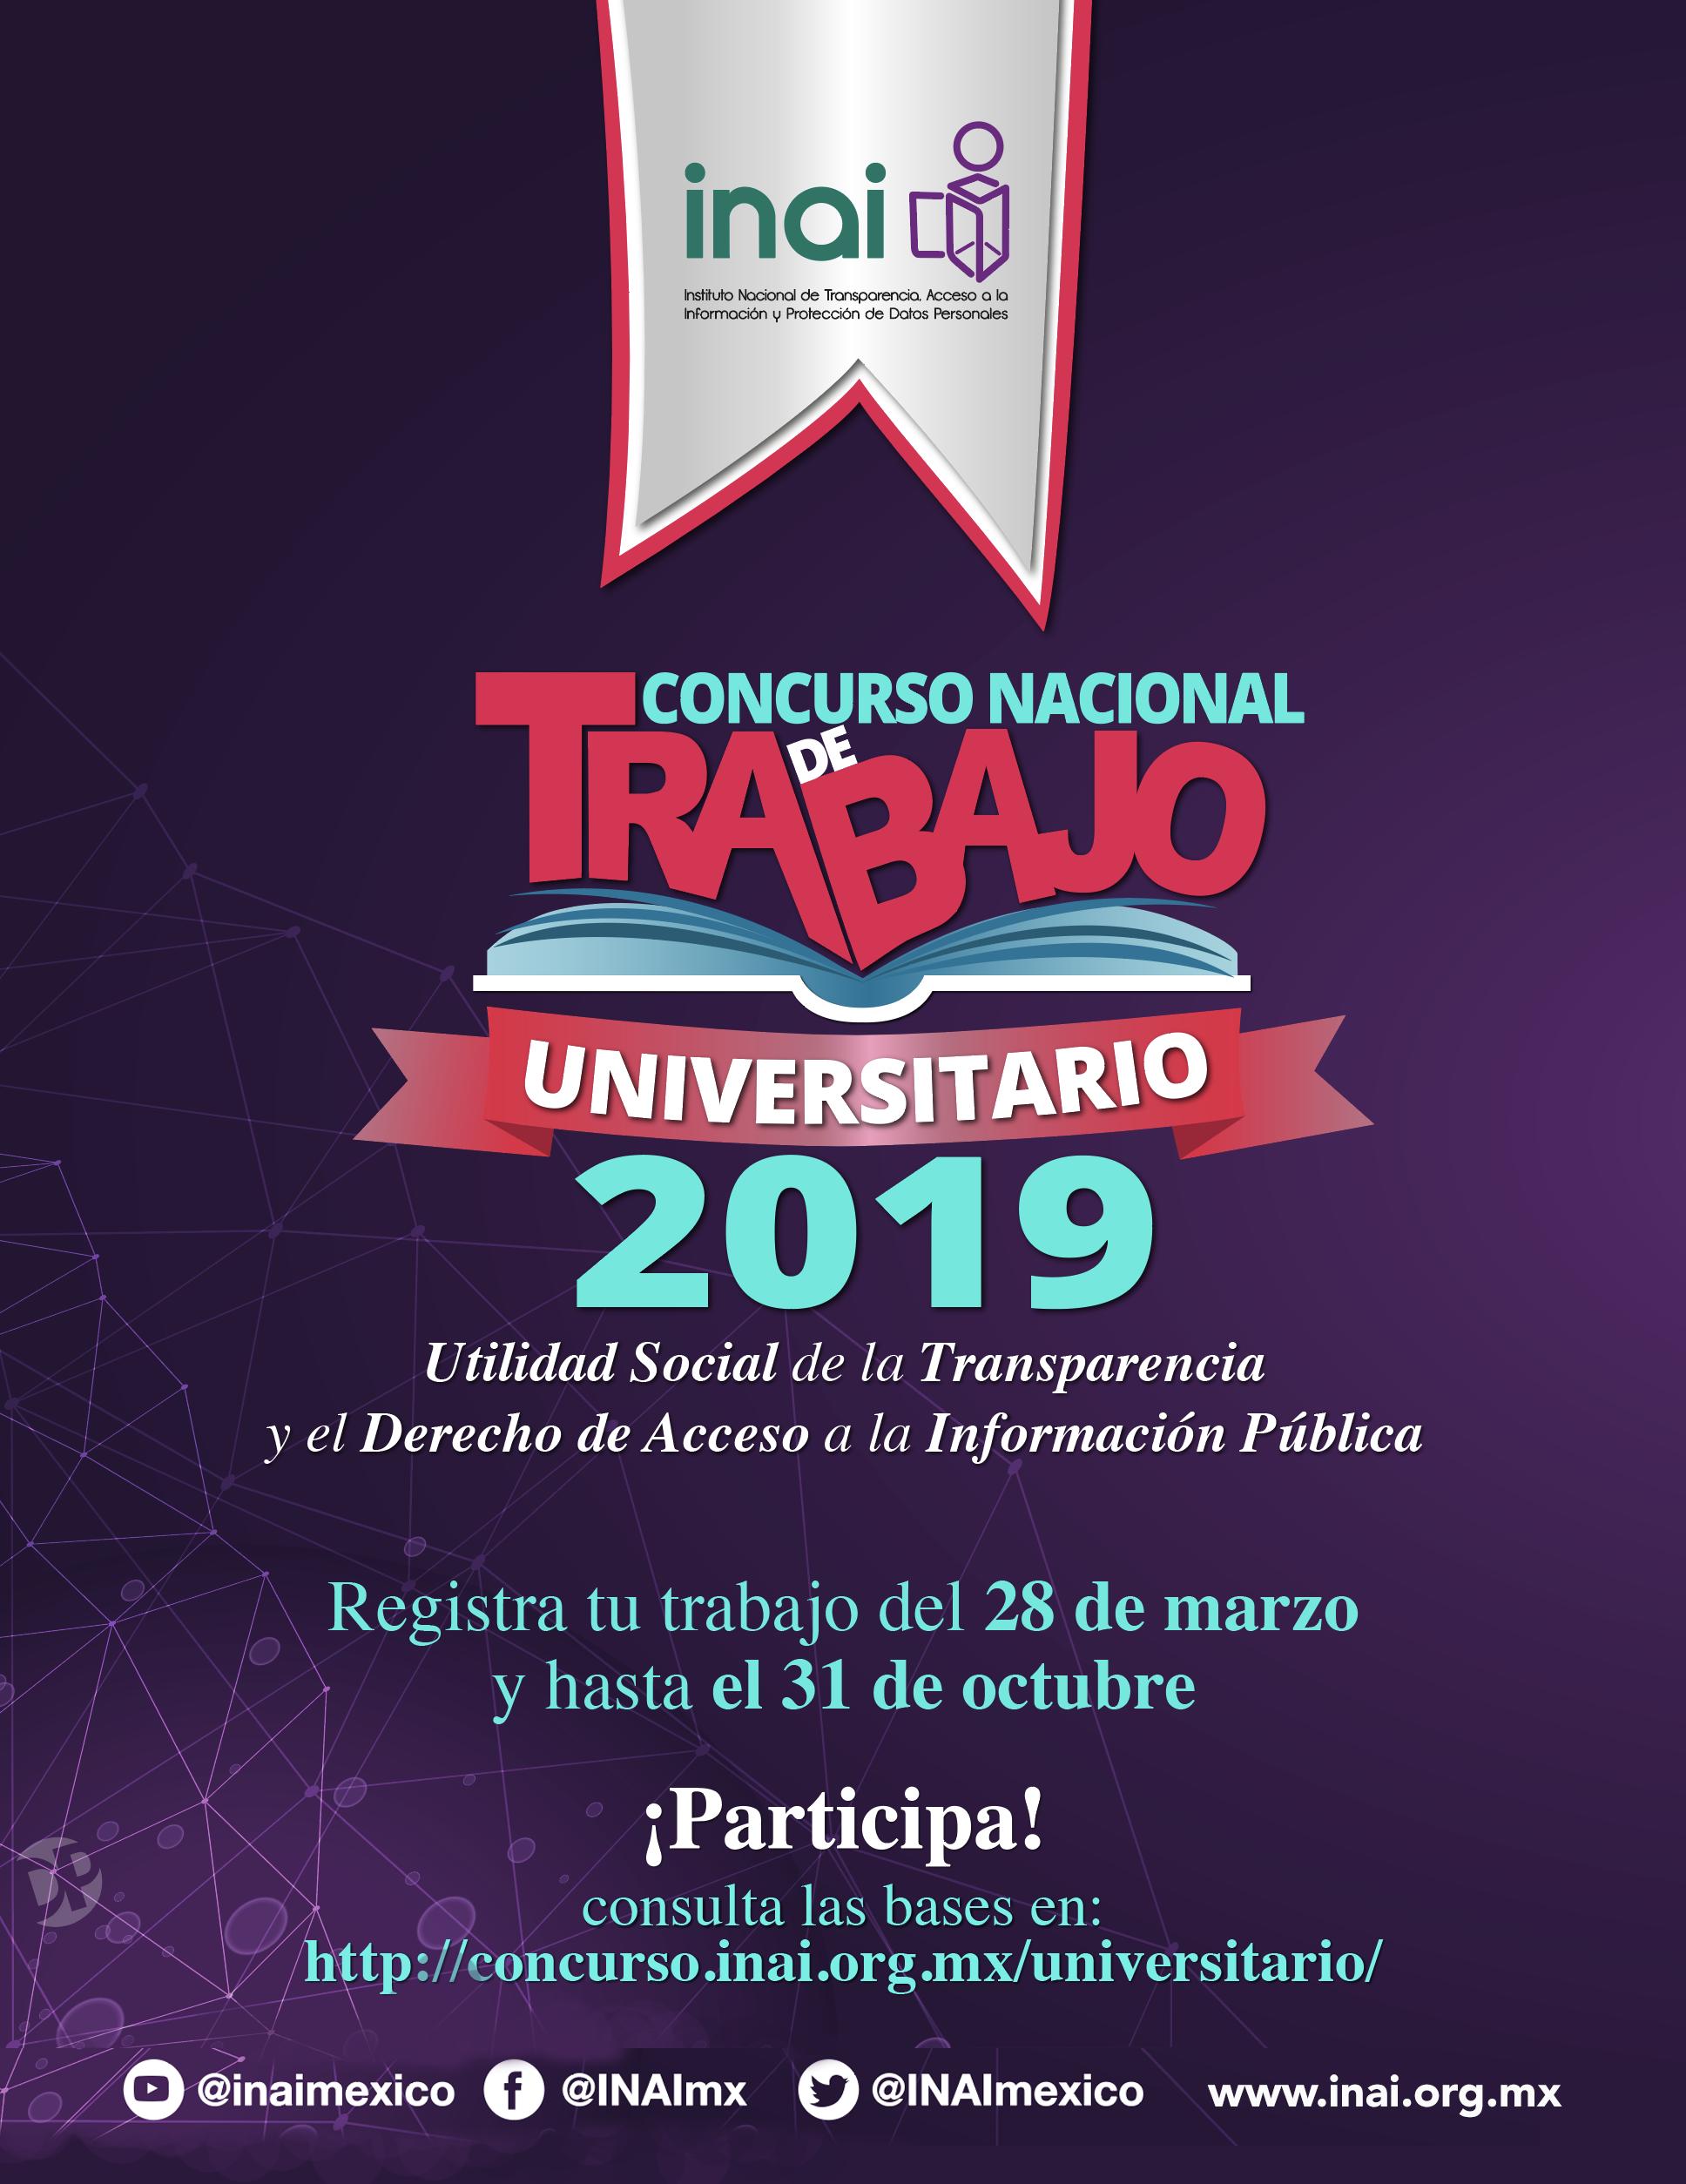 INAI :: Concurso Nacional de Trabajo Universitario 2019